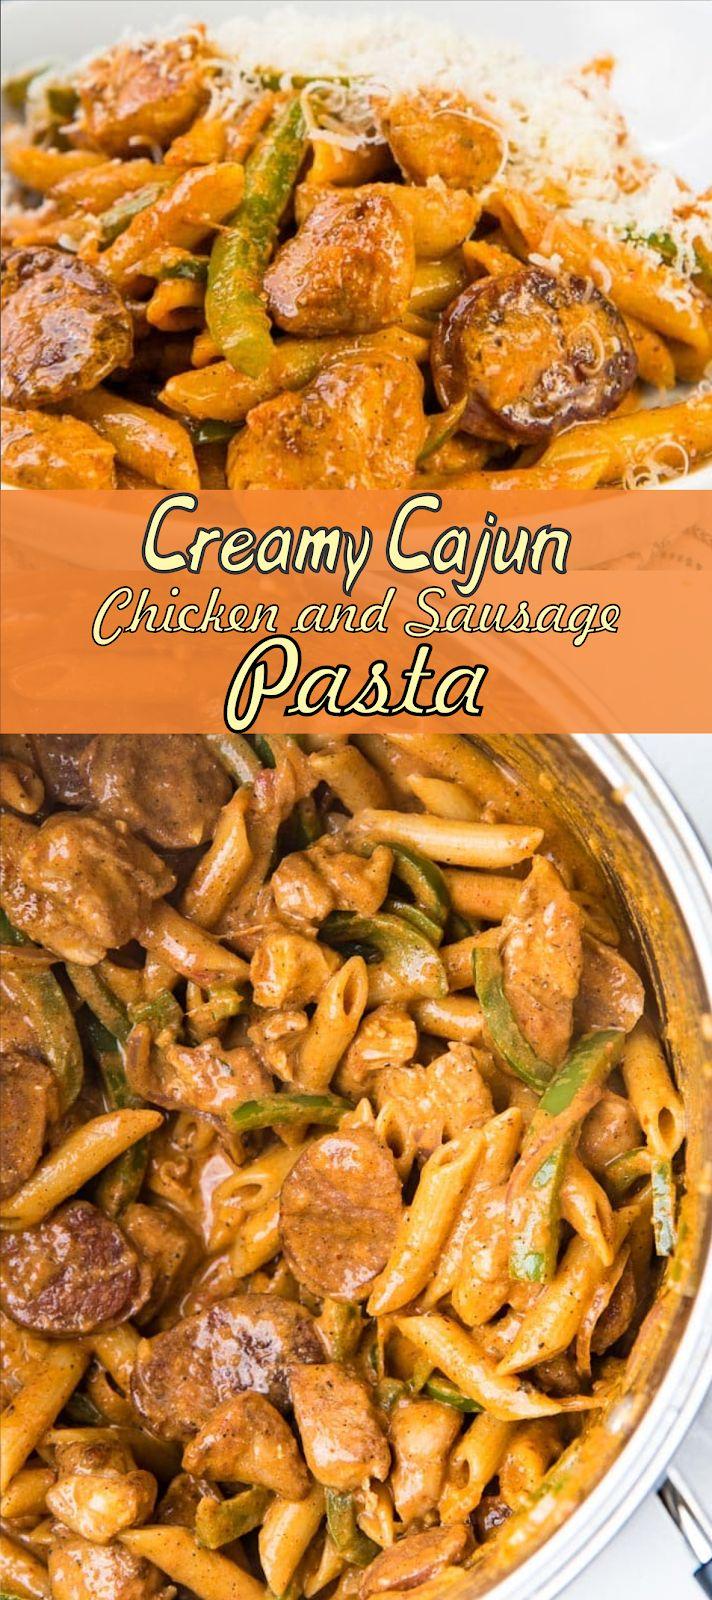 Creamy Cajun Chicken and Sausage Pasta | Floats CO…